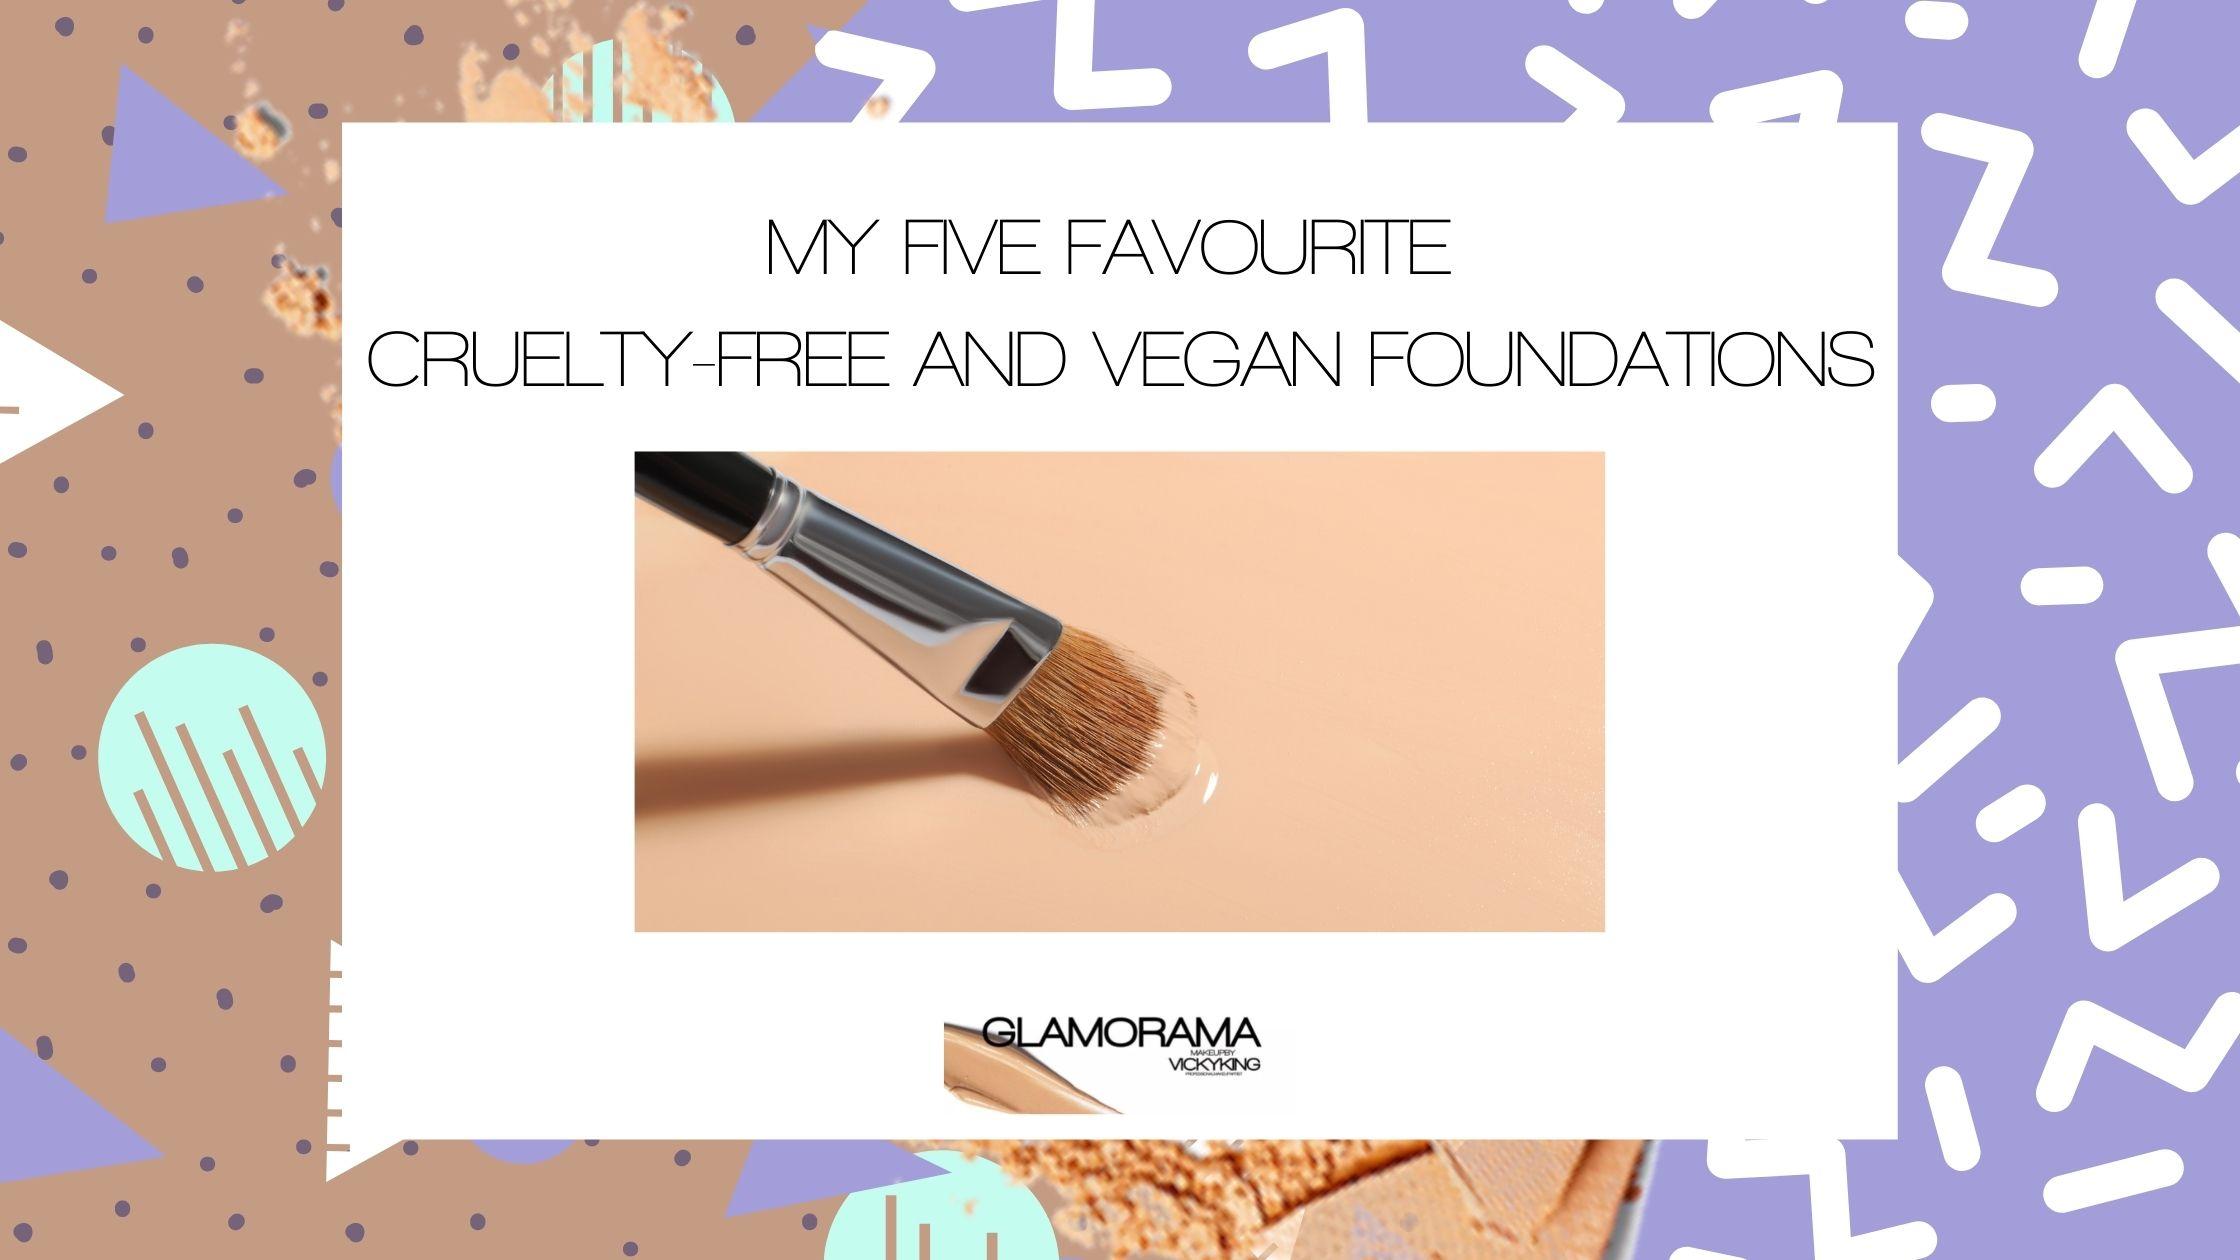 Cruelty-free and Vegan foundations